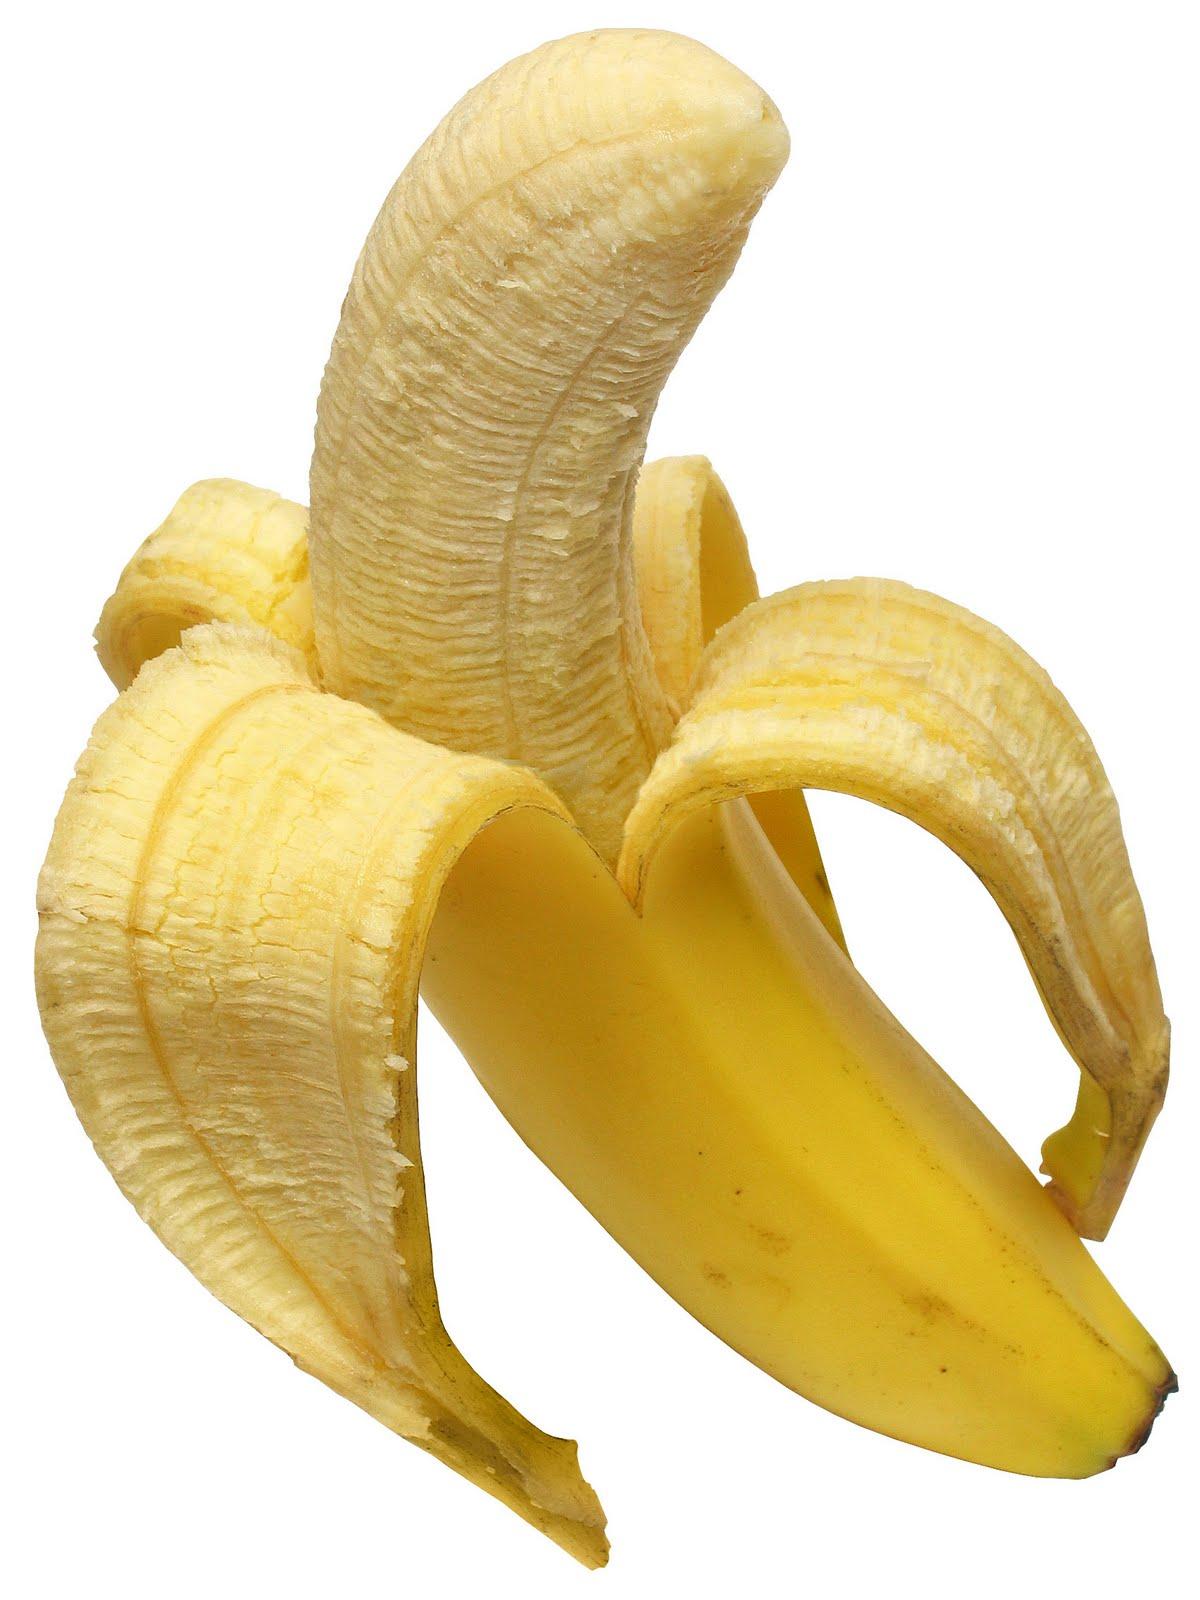 banana+unpeeled